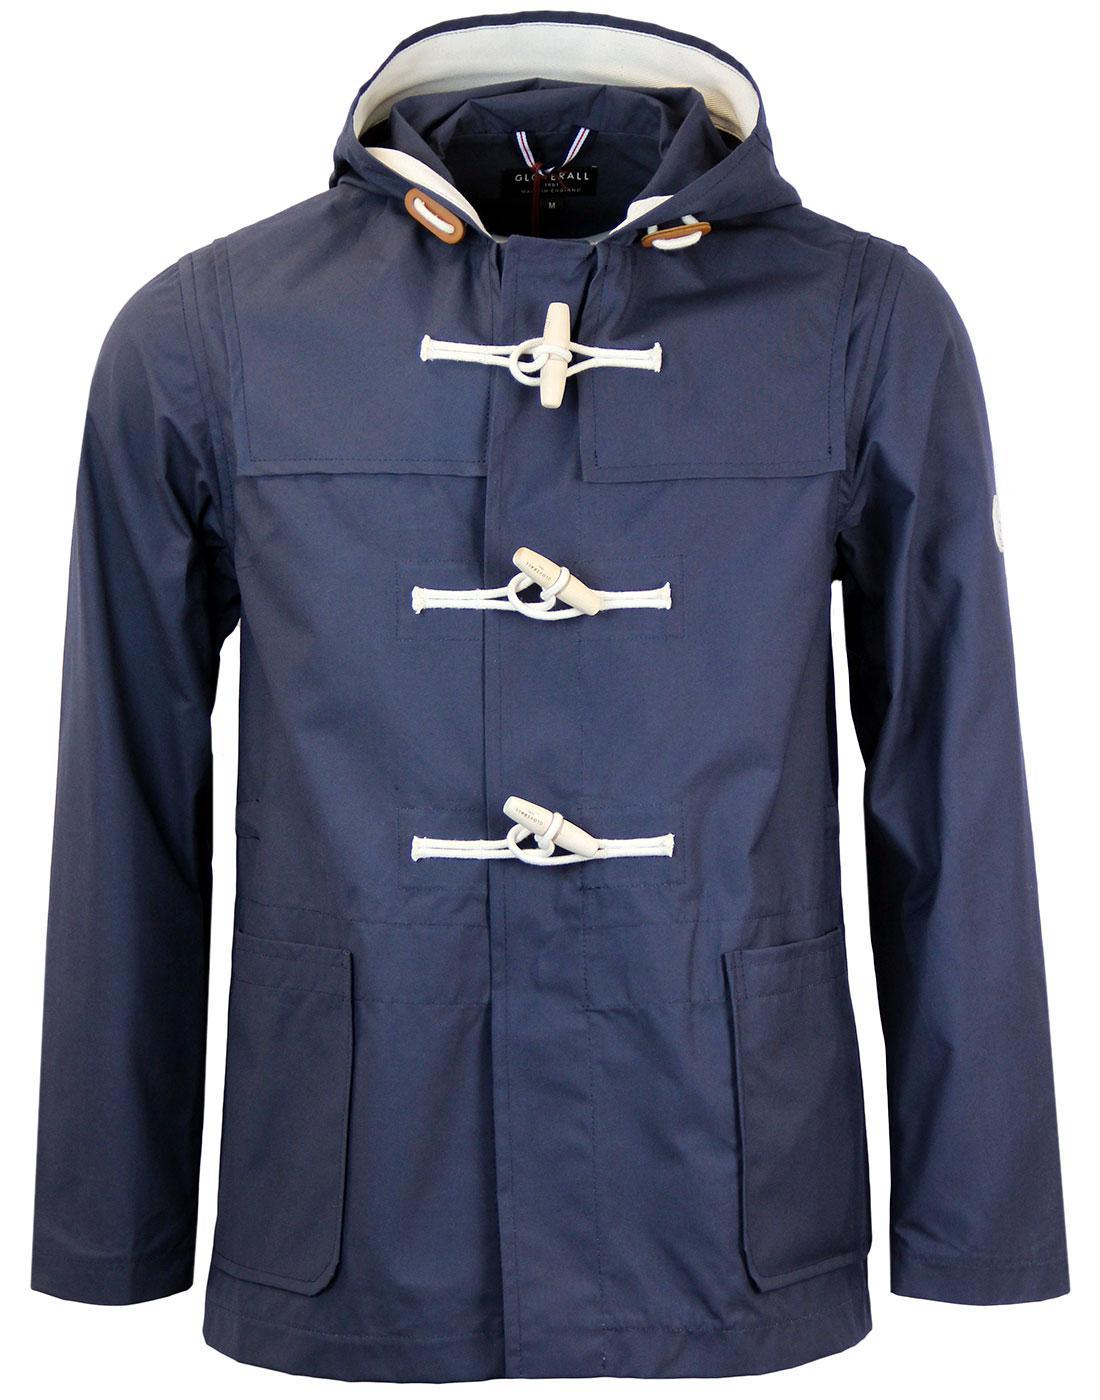 GLOVERALL Retro Mod Showerproof Cotton Duffle Coat